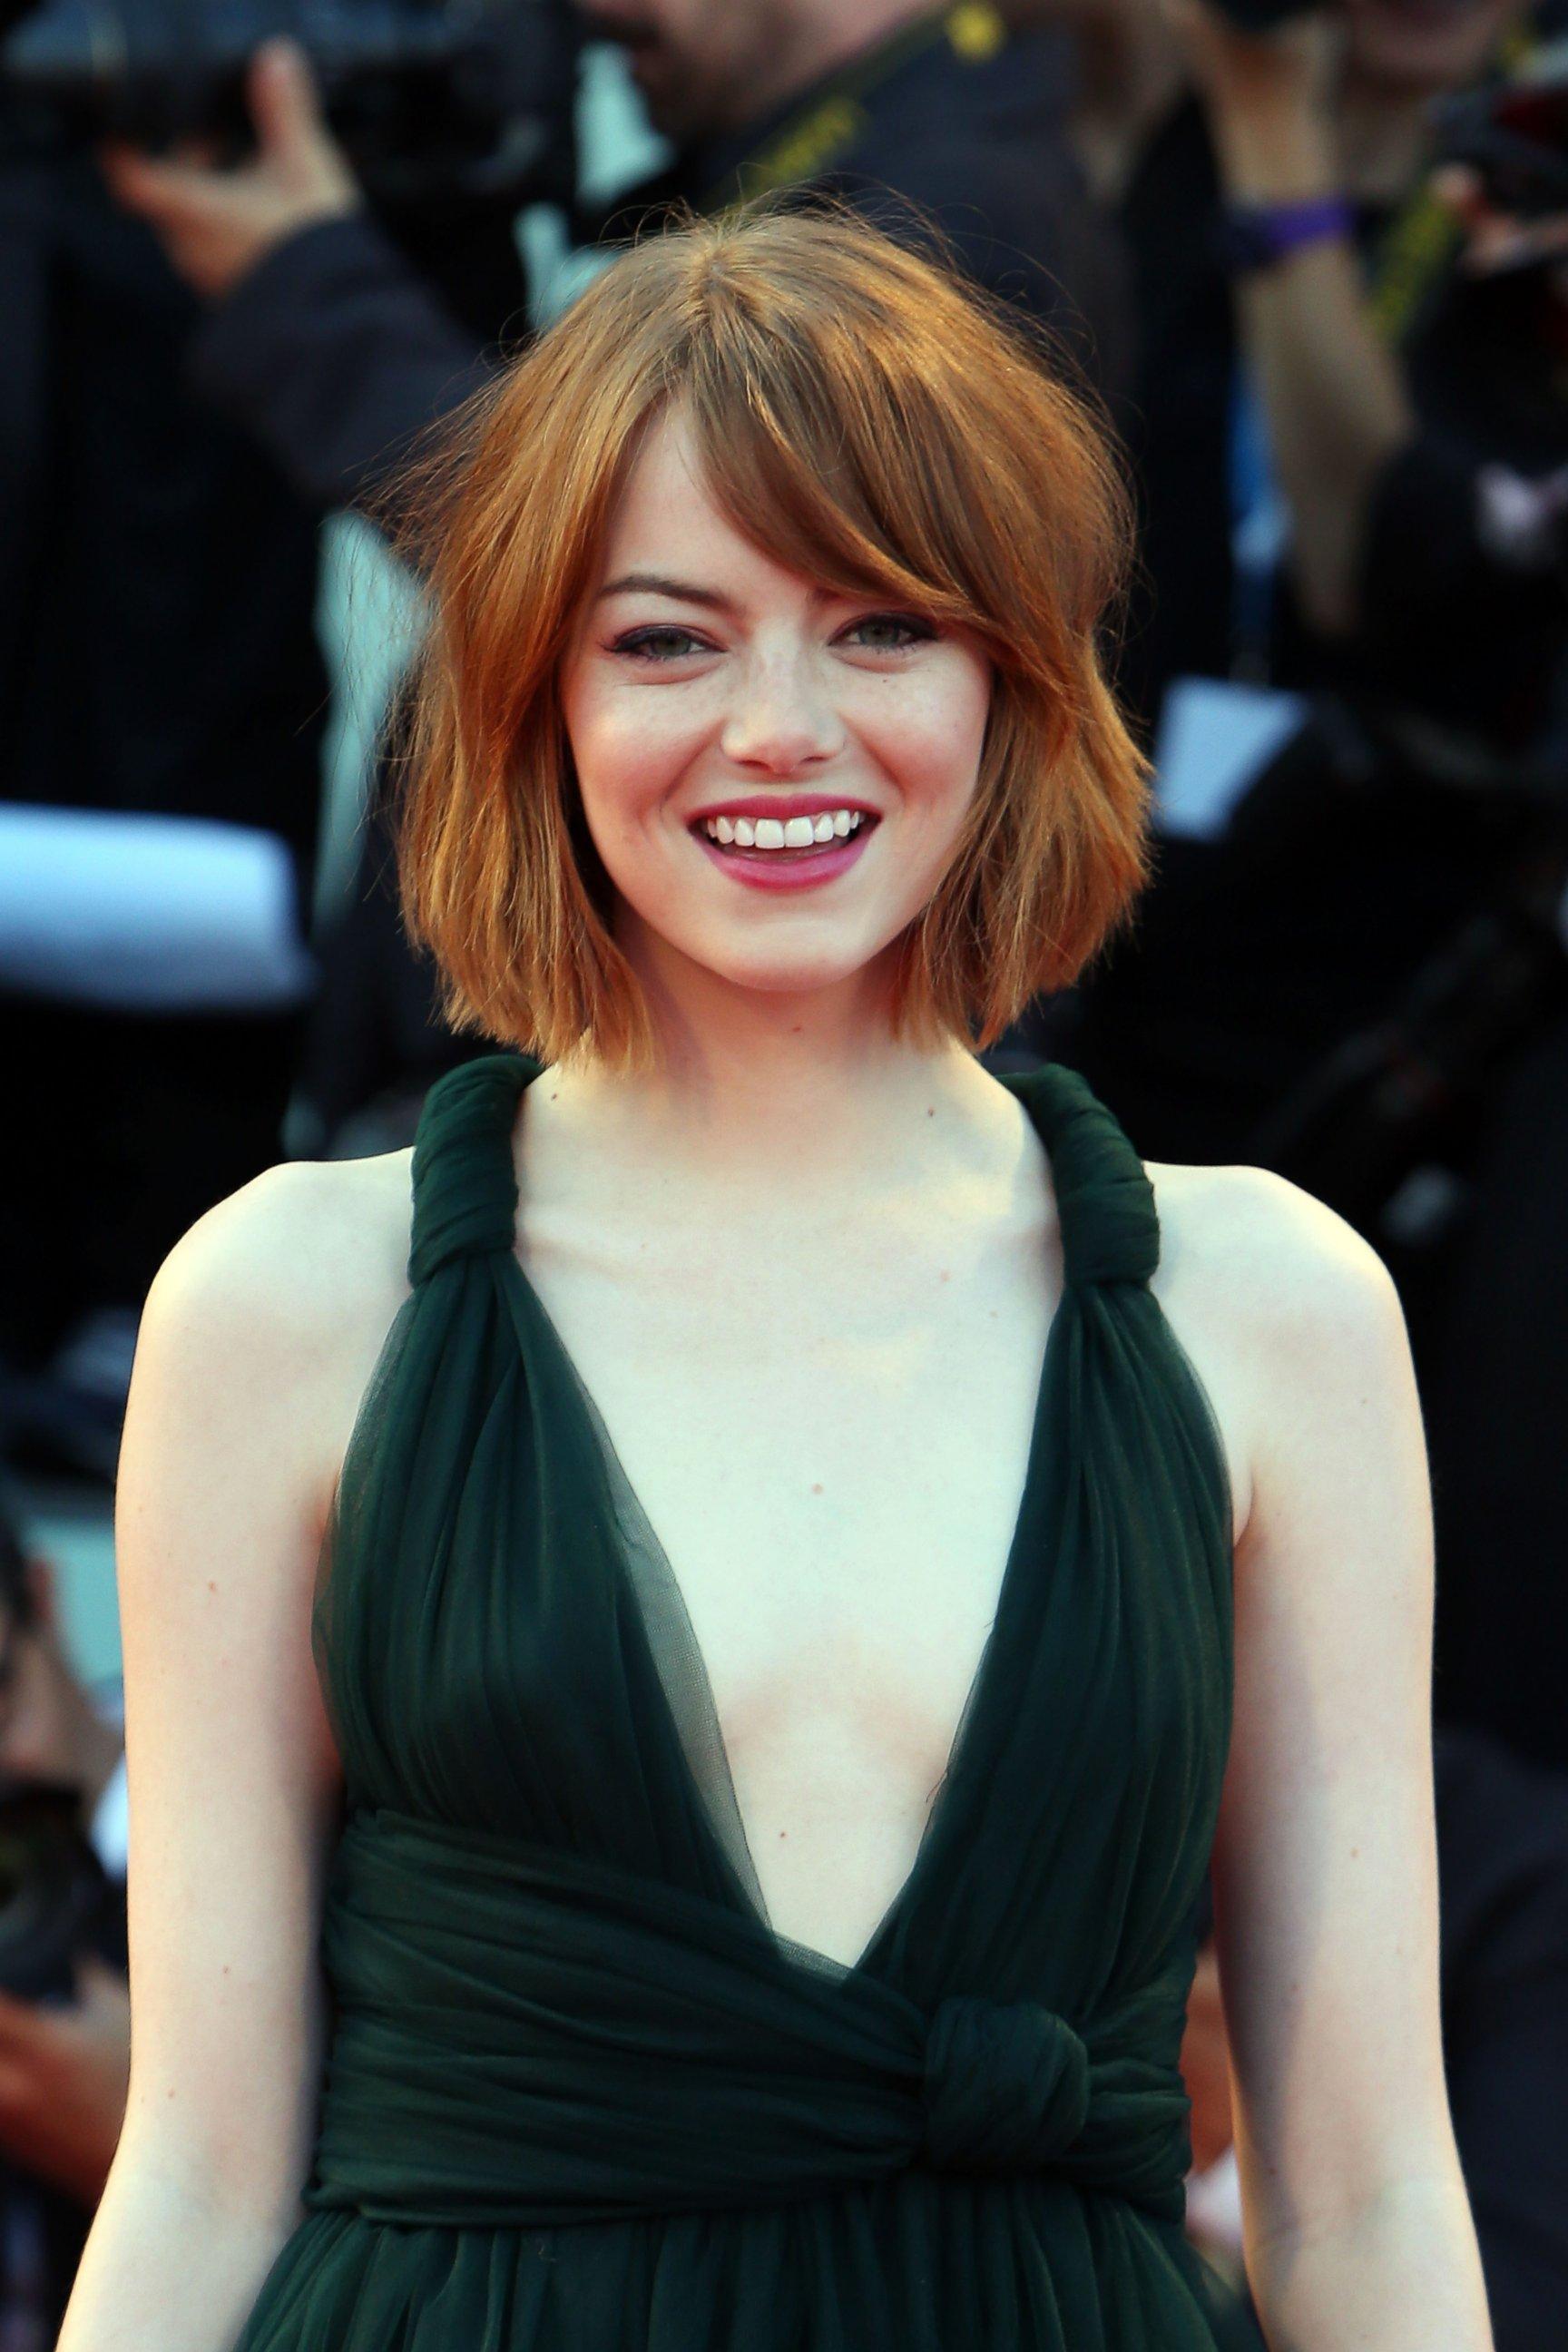 Emma Stone Debuts as Blunt Bob